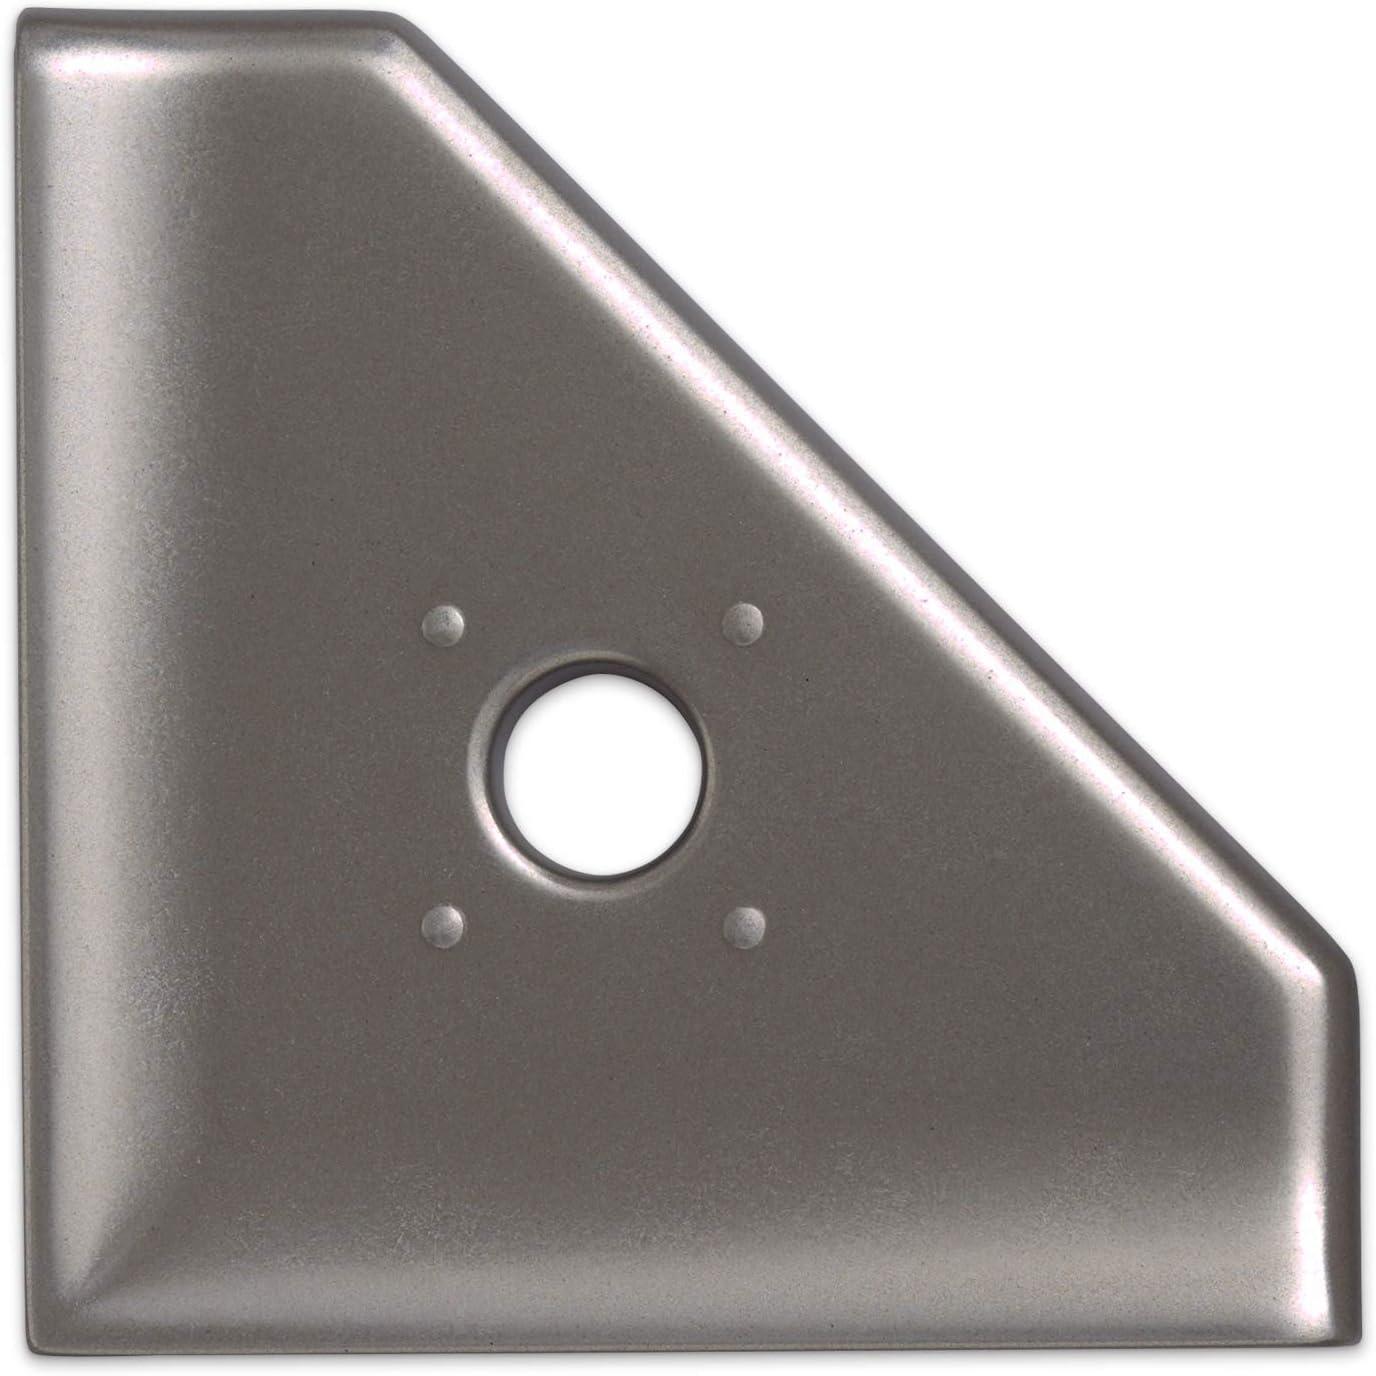 5 inch Shower Caddy Soap Dish - Brushed Nickel Cast Metal Corner Soap Tray Bathroom Organizer Geo Wall Mount Flatback Shelf: Home Improvement